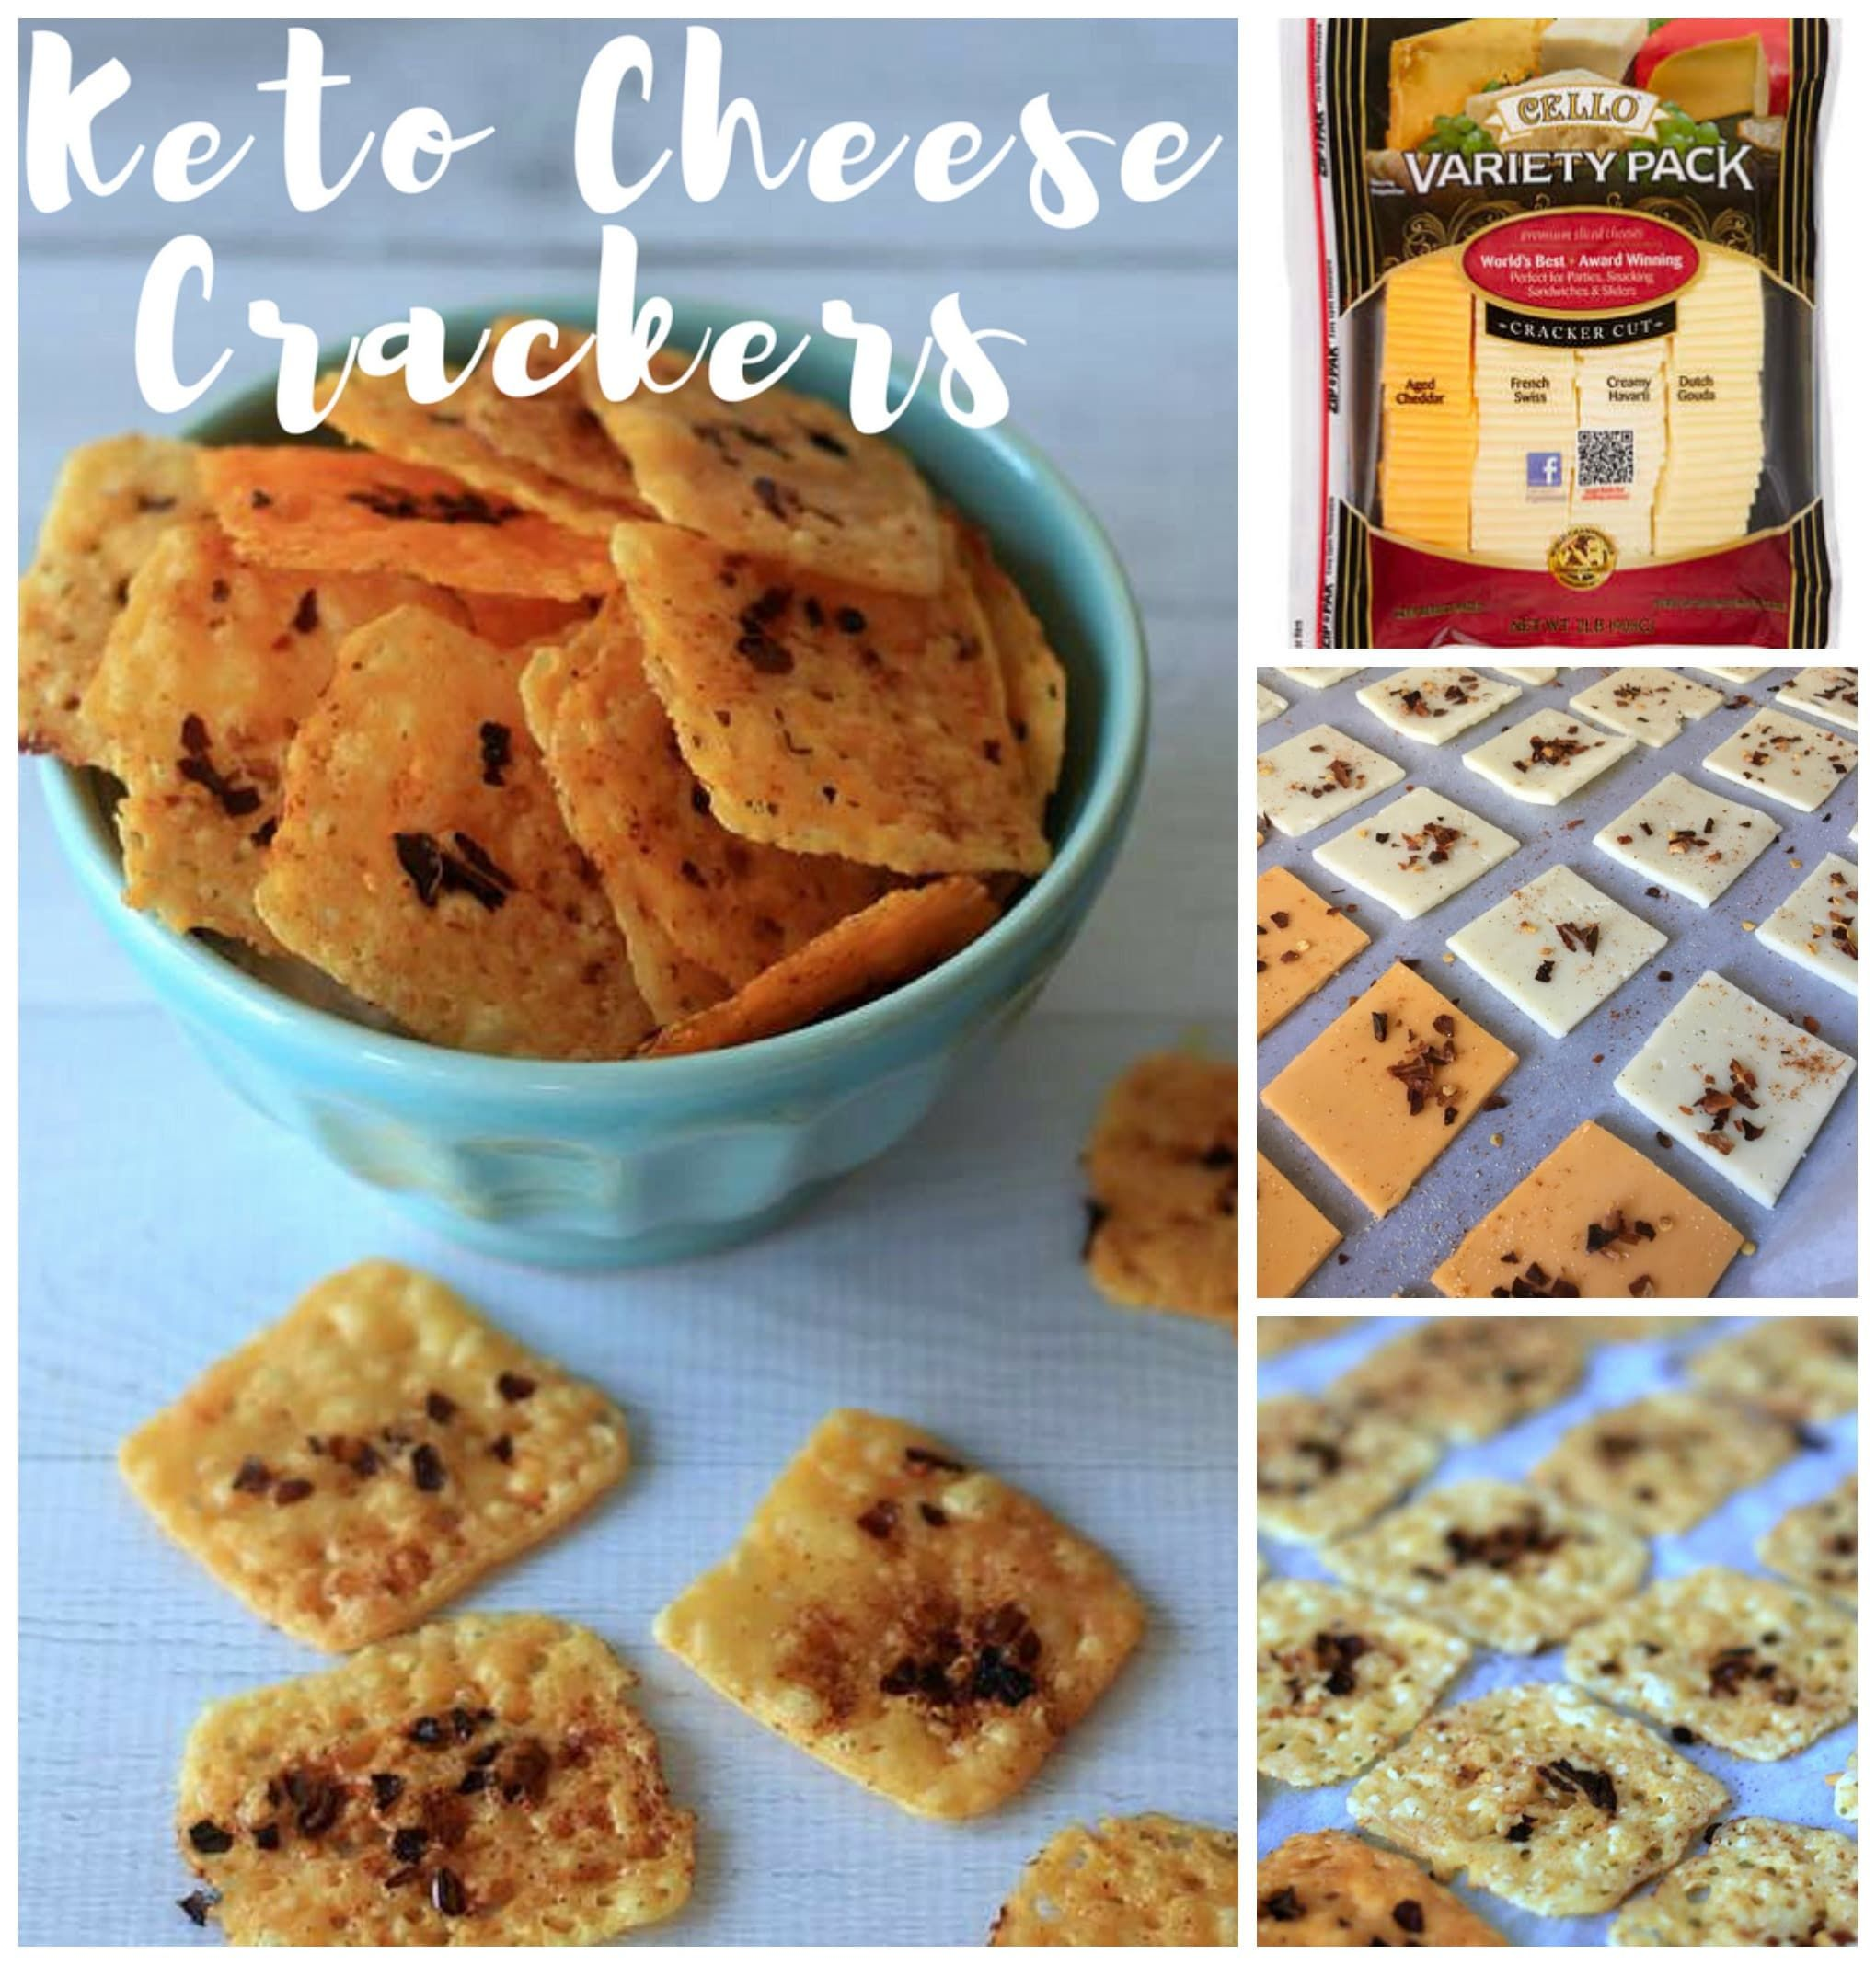 best snack crackers for keto diet